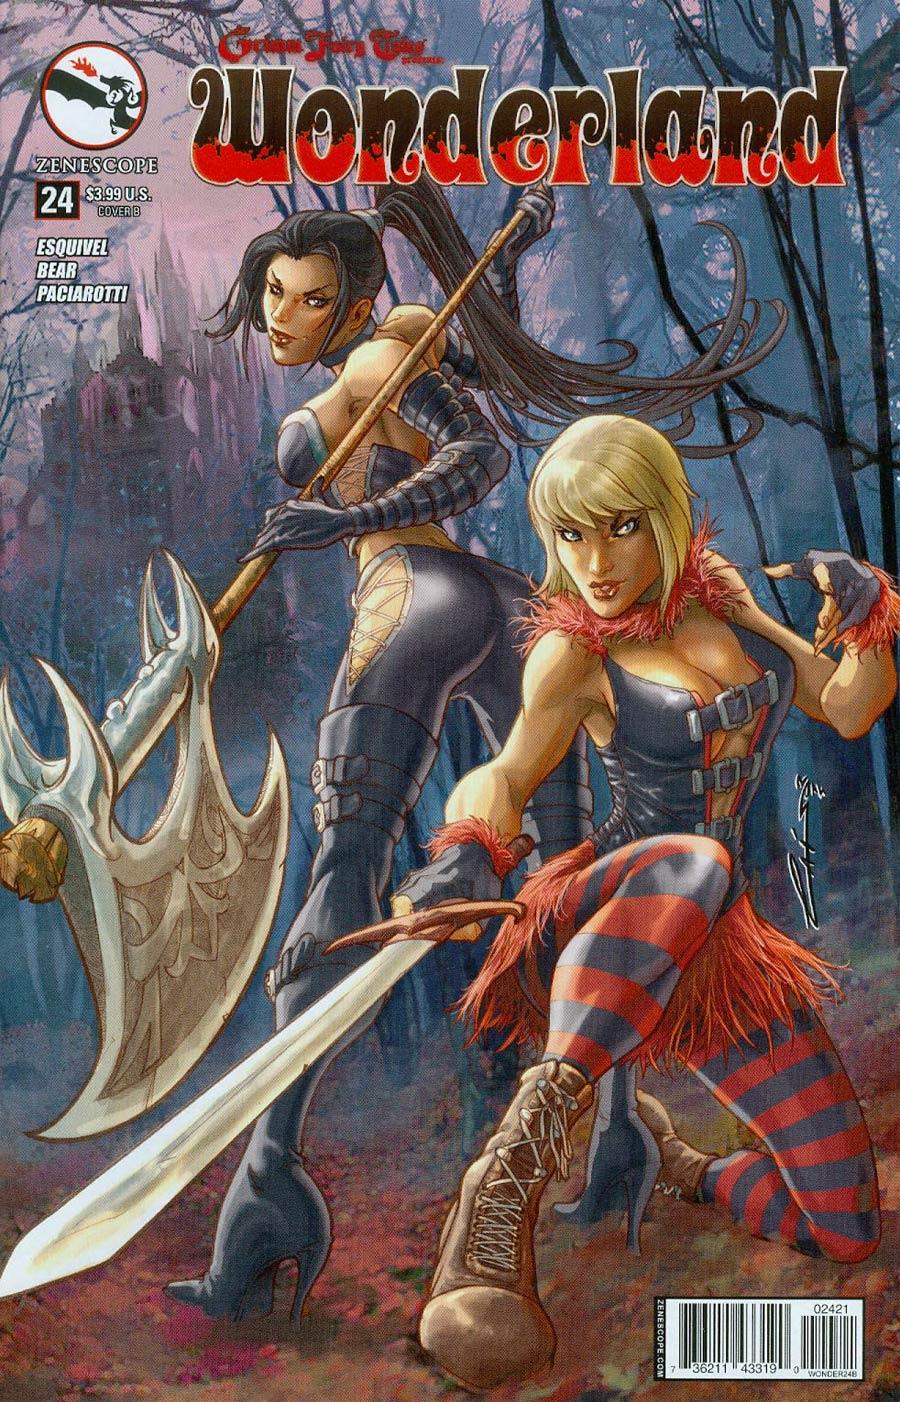 Grimm Fairy Tales Presents Wonderland Vol 2 #24 Cover B Emilio Laiso